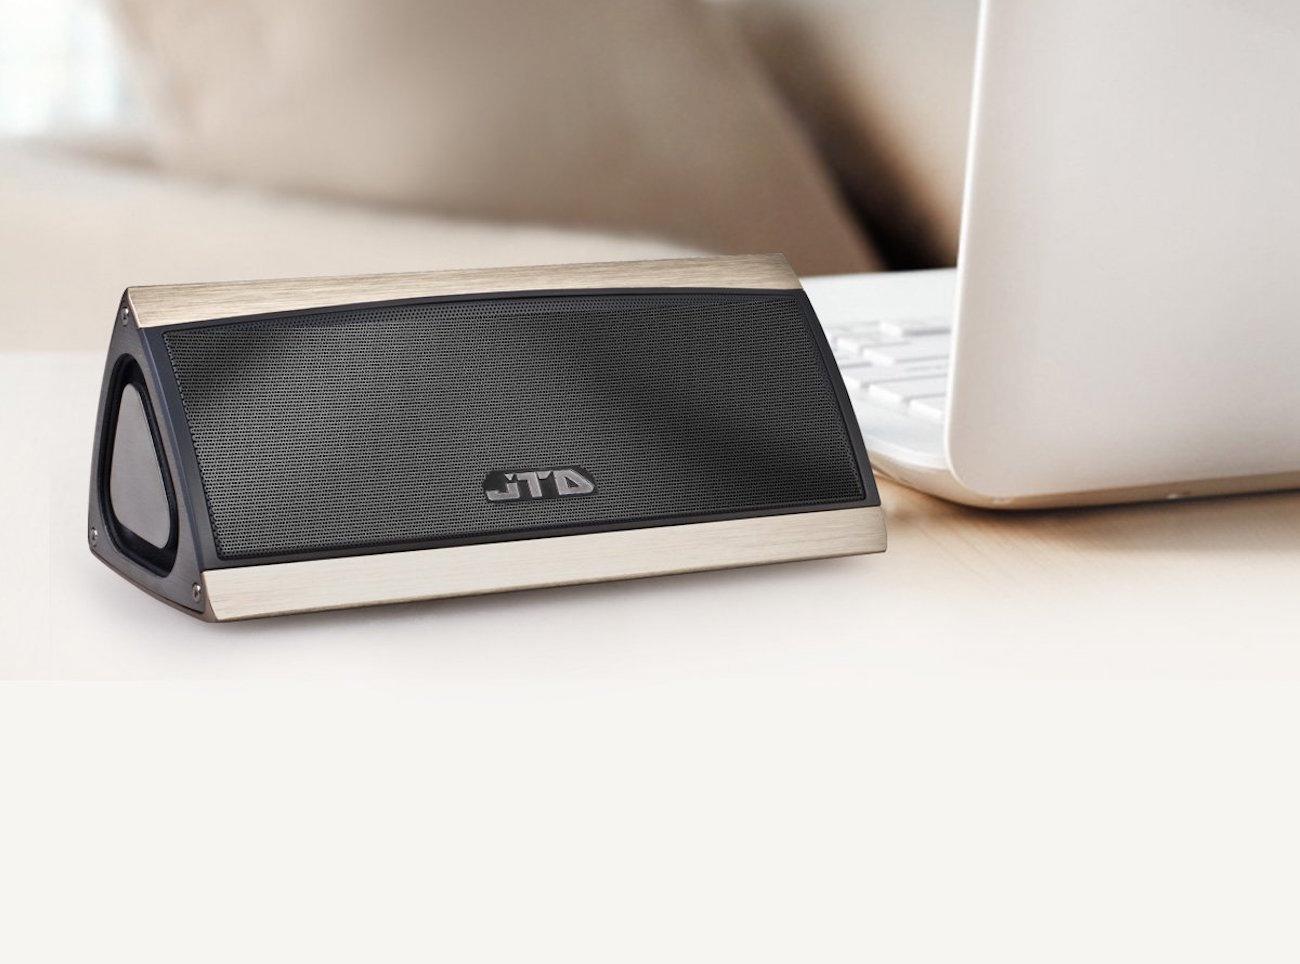 JTD ® Portable Wireless Bluetooth Speaker